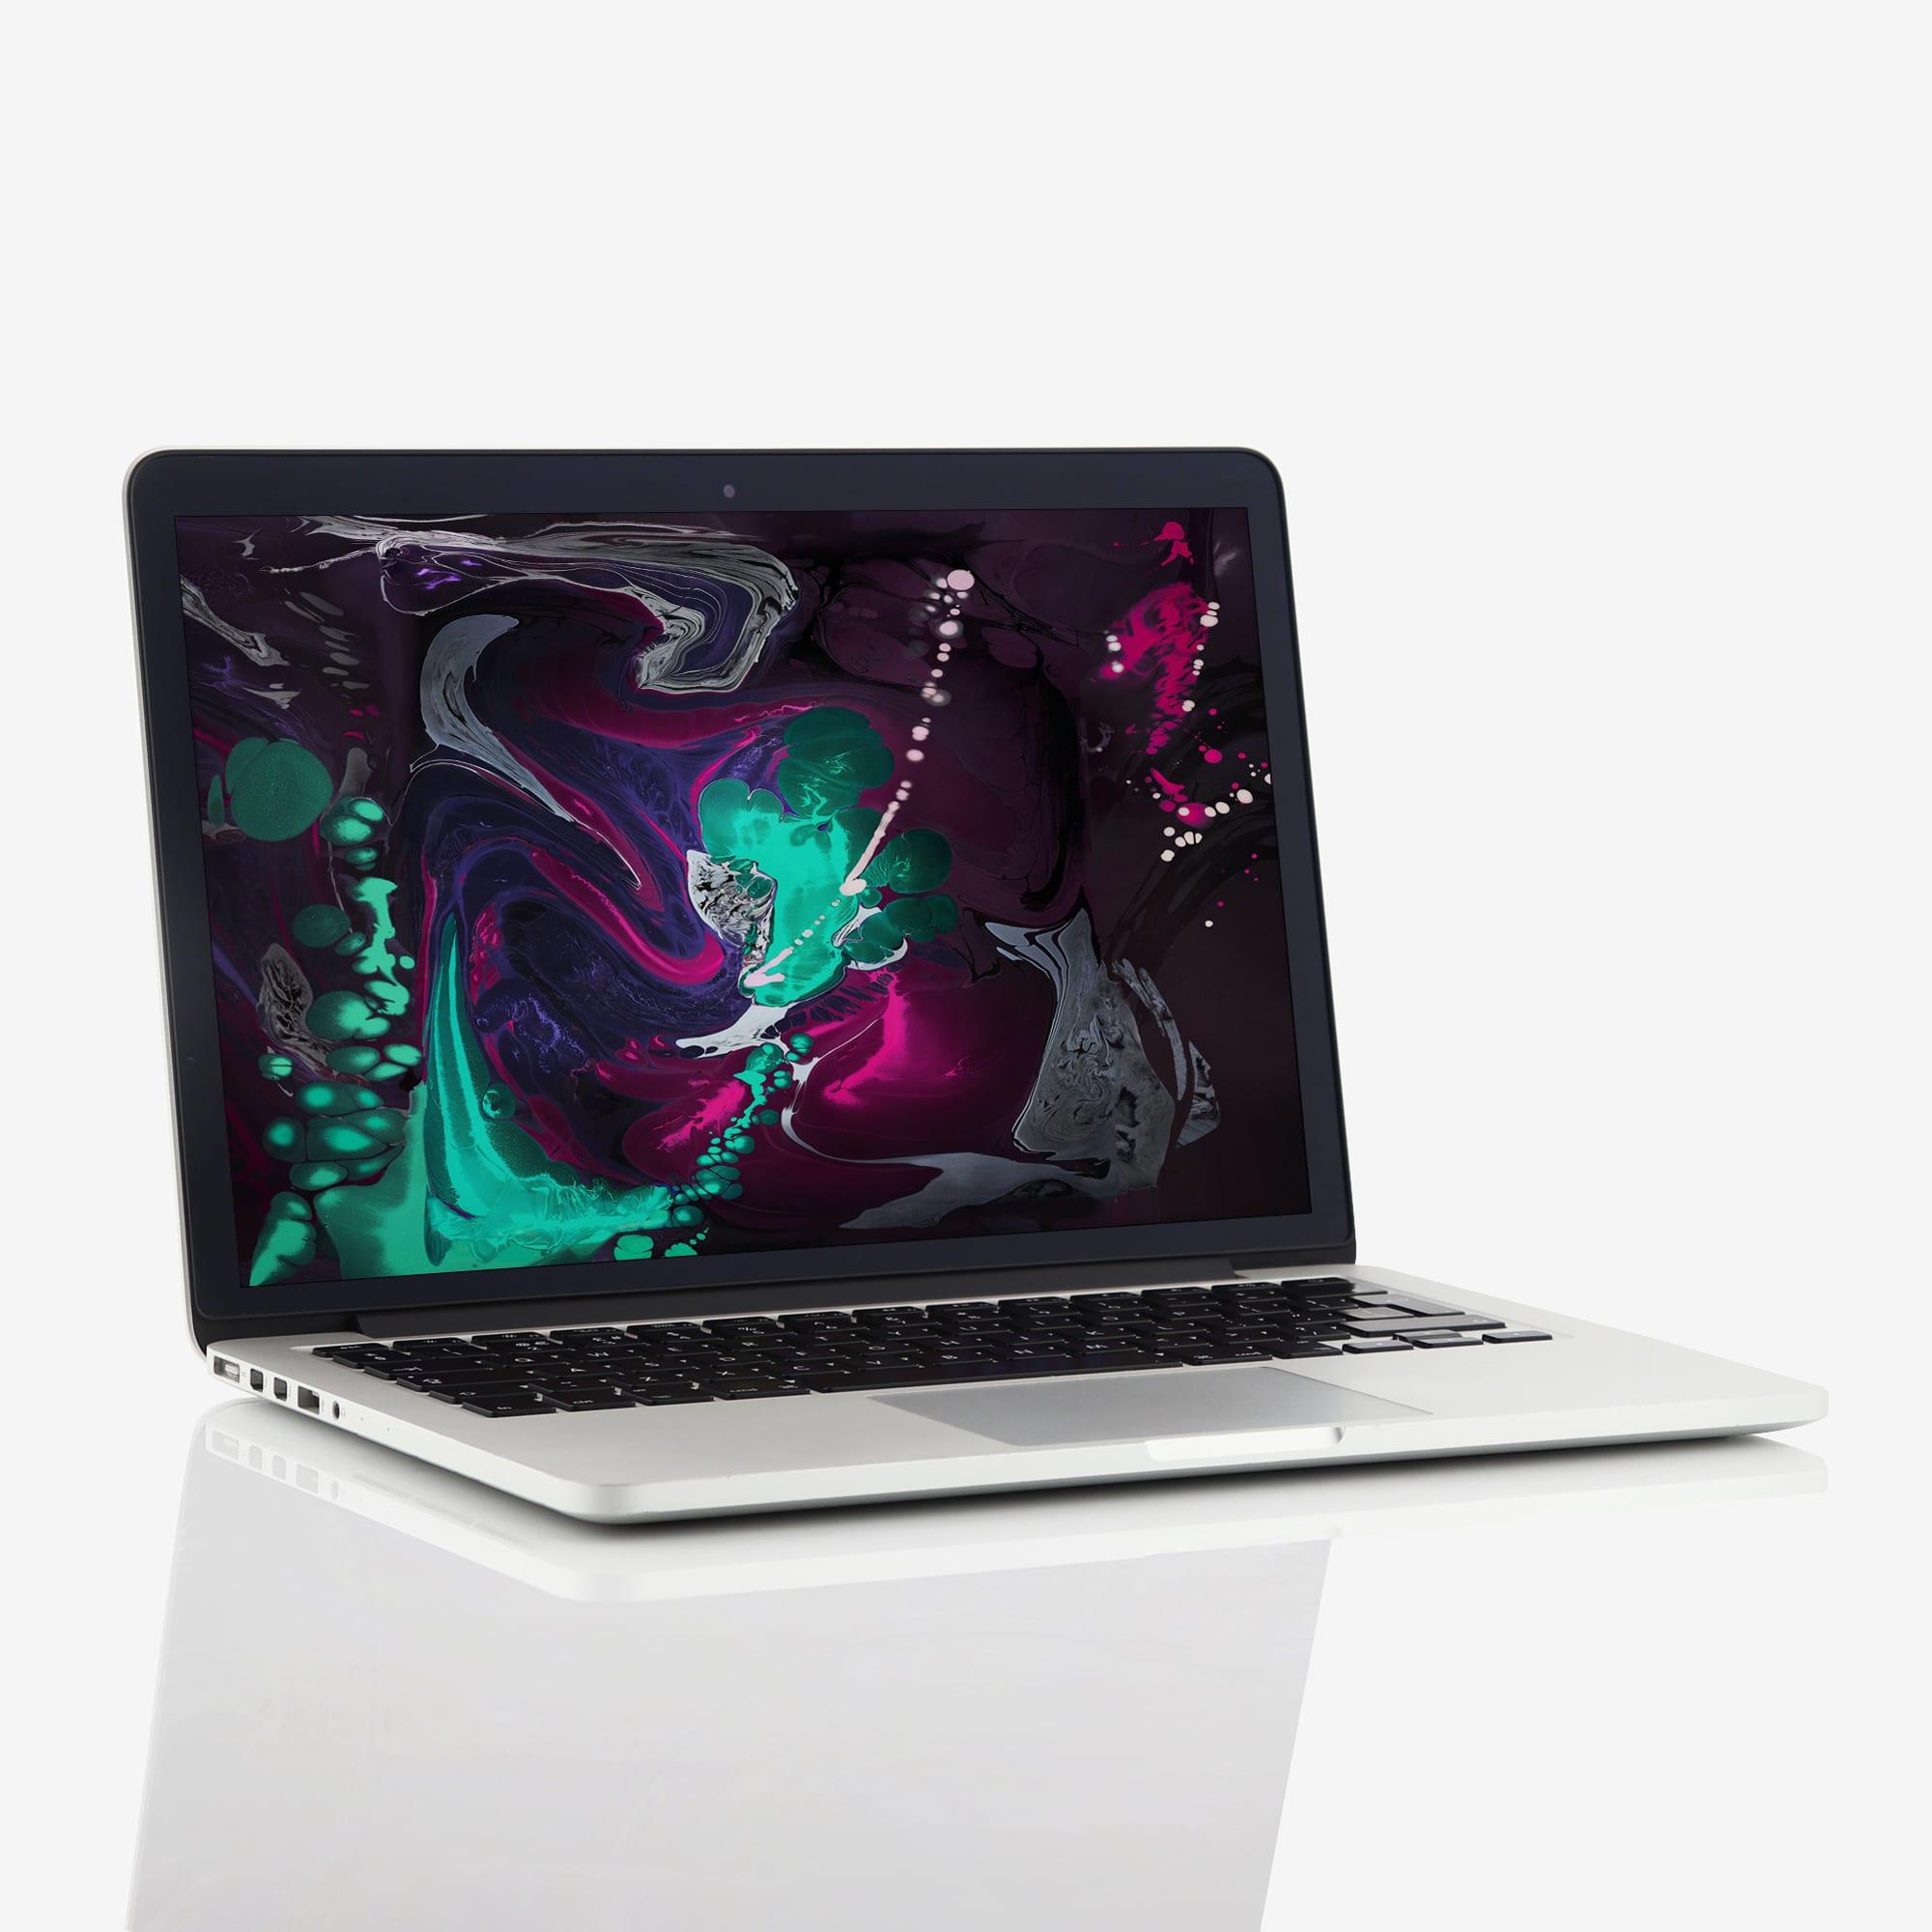 1 x Apple MacBook Pro Retina 13 Inch Intel Core i5 2.50 GHz (2012)